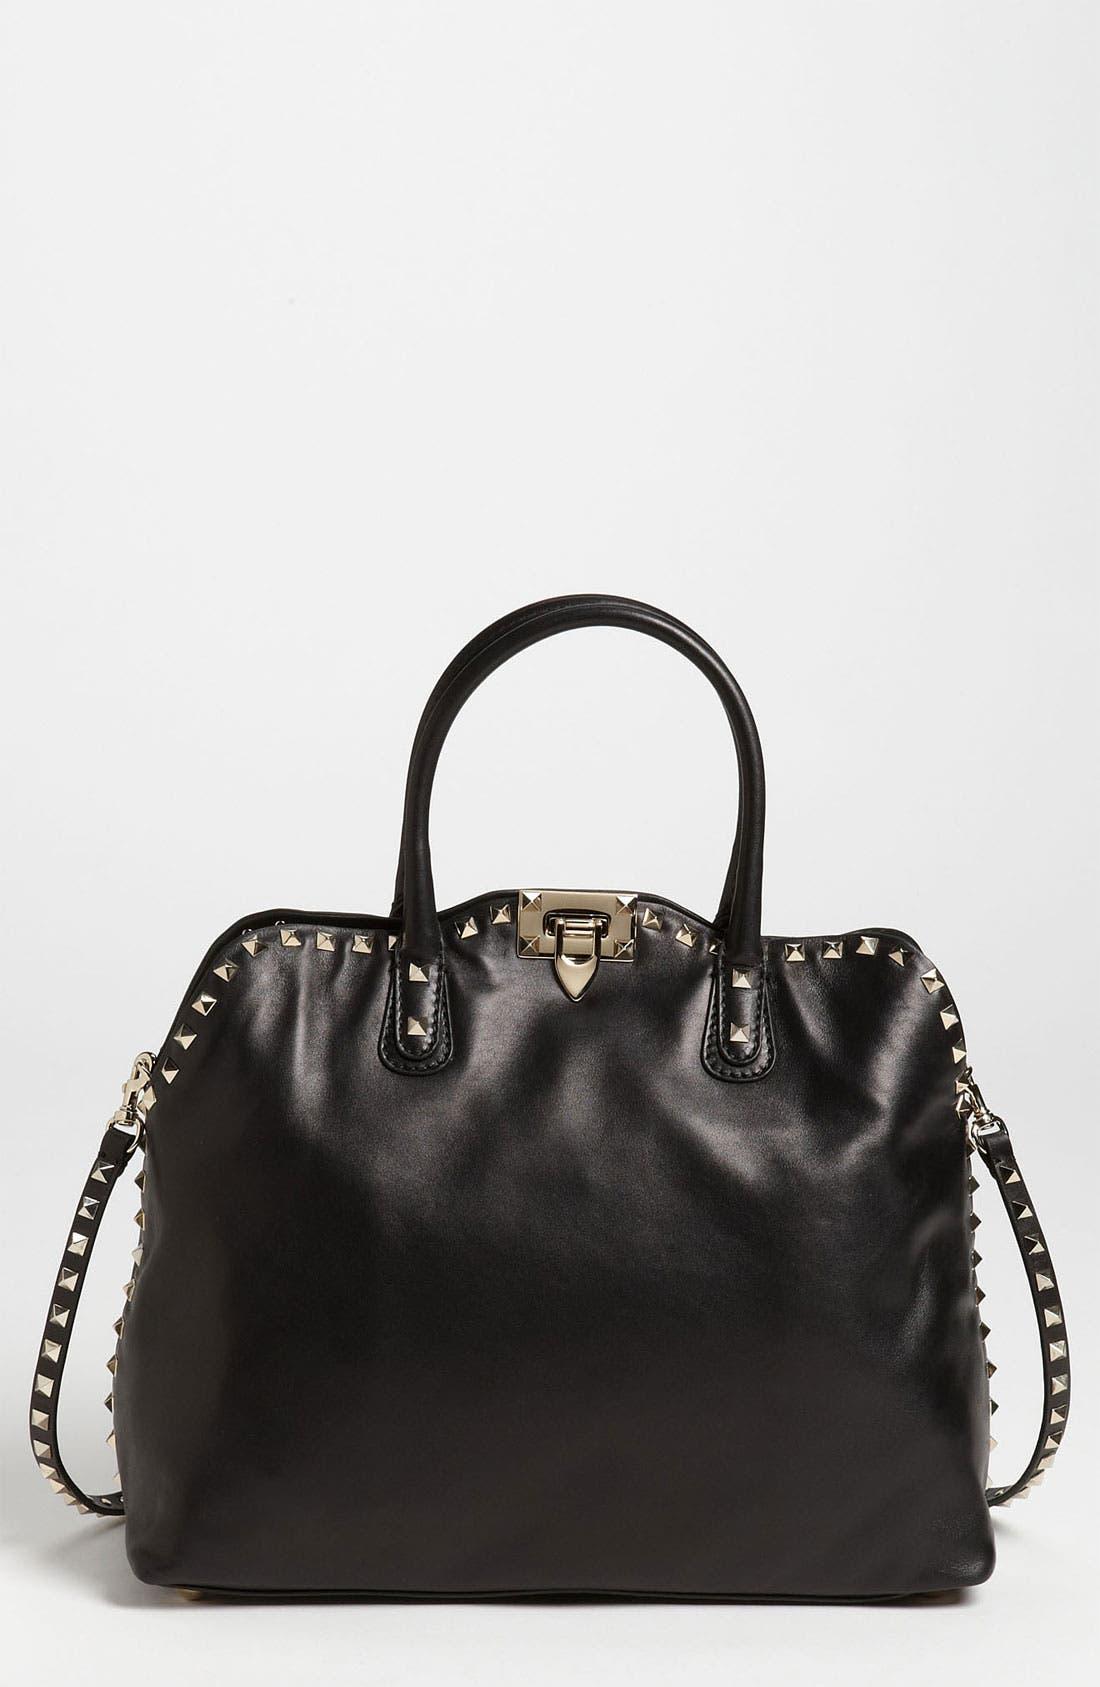 Main Image - Valentino 'Rockstud' Leather Dome Handbag